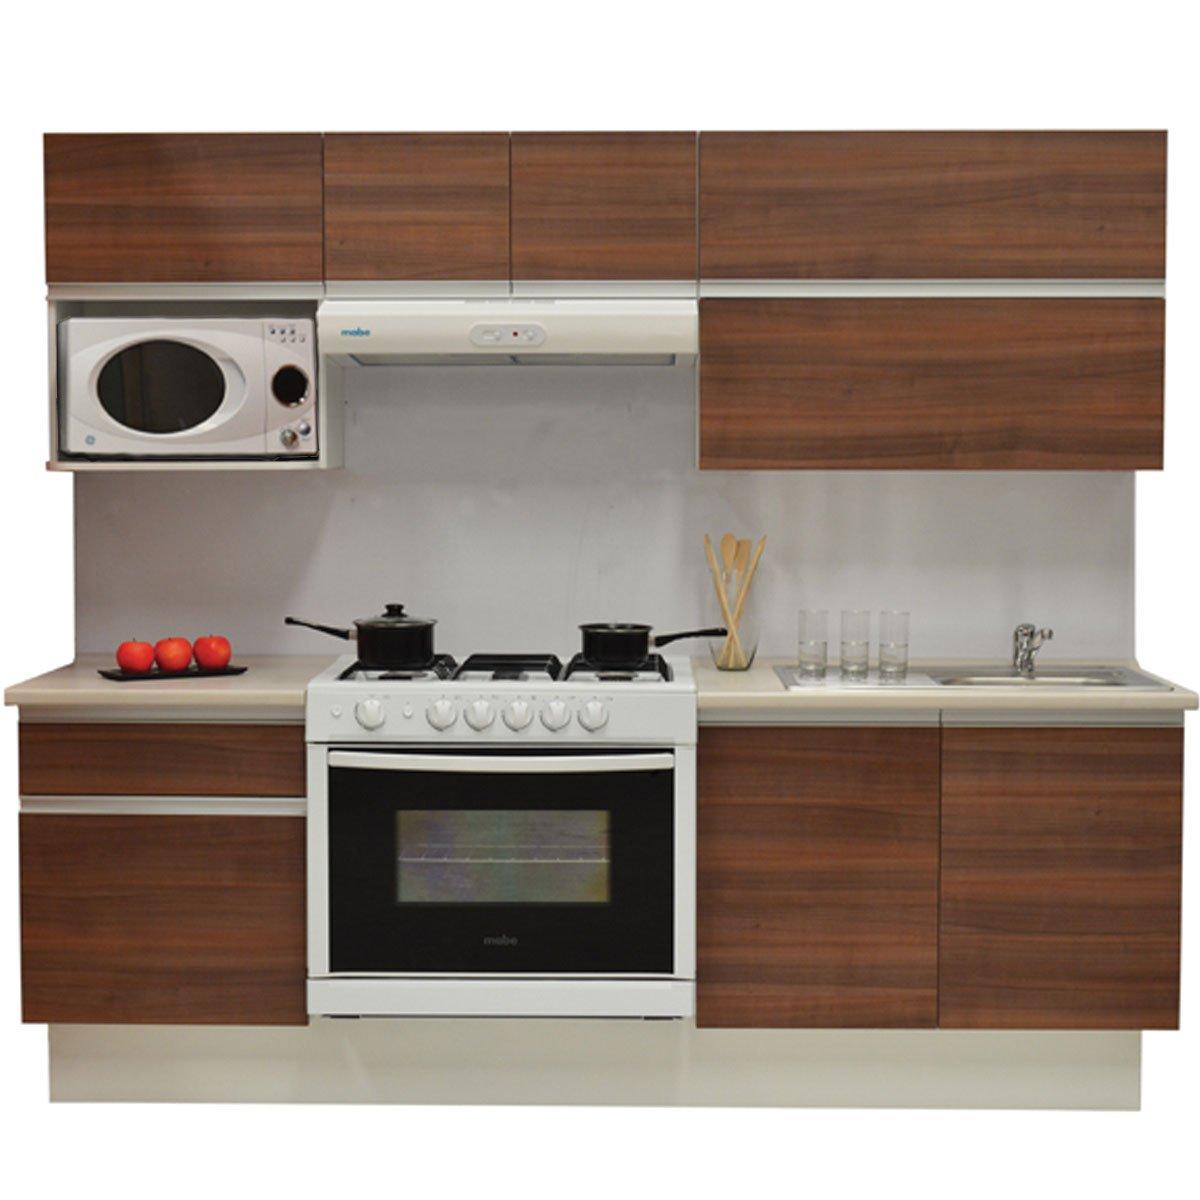 Compra en l nea con cargo a tu recibo telmex for Programa para disenar cocinas integrales en linea